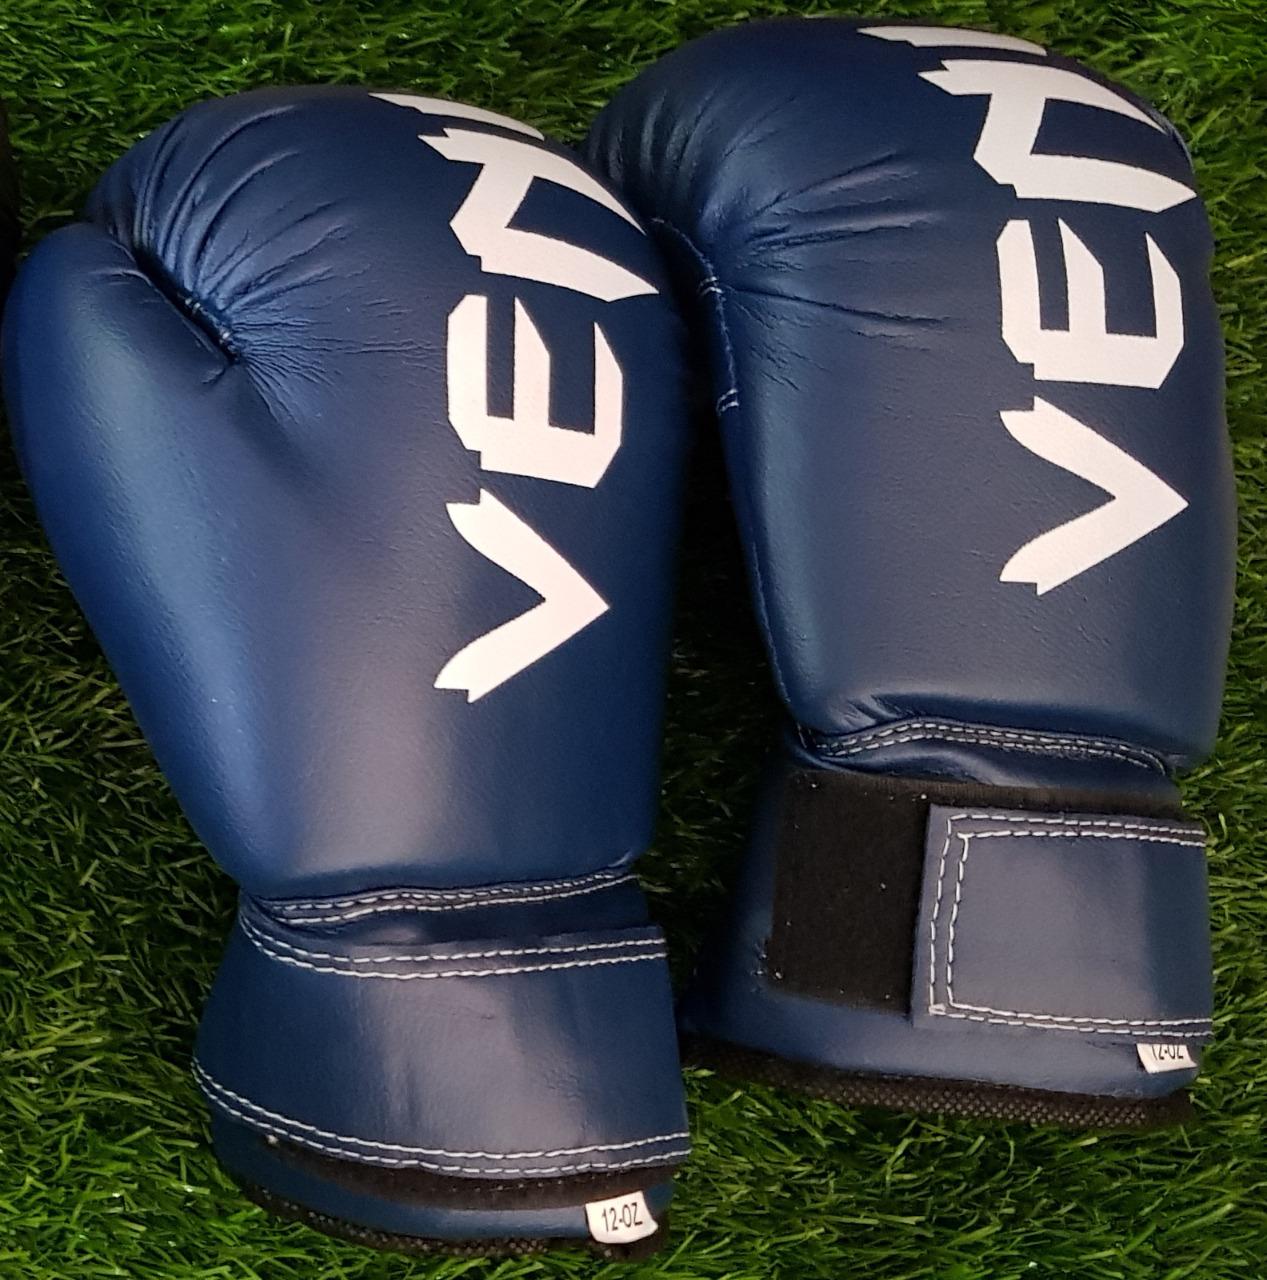 Venum Kick Boxing Gloves PU Karate Training Adult Punching Gloves High Quality